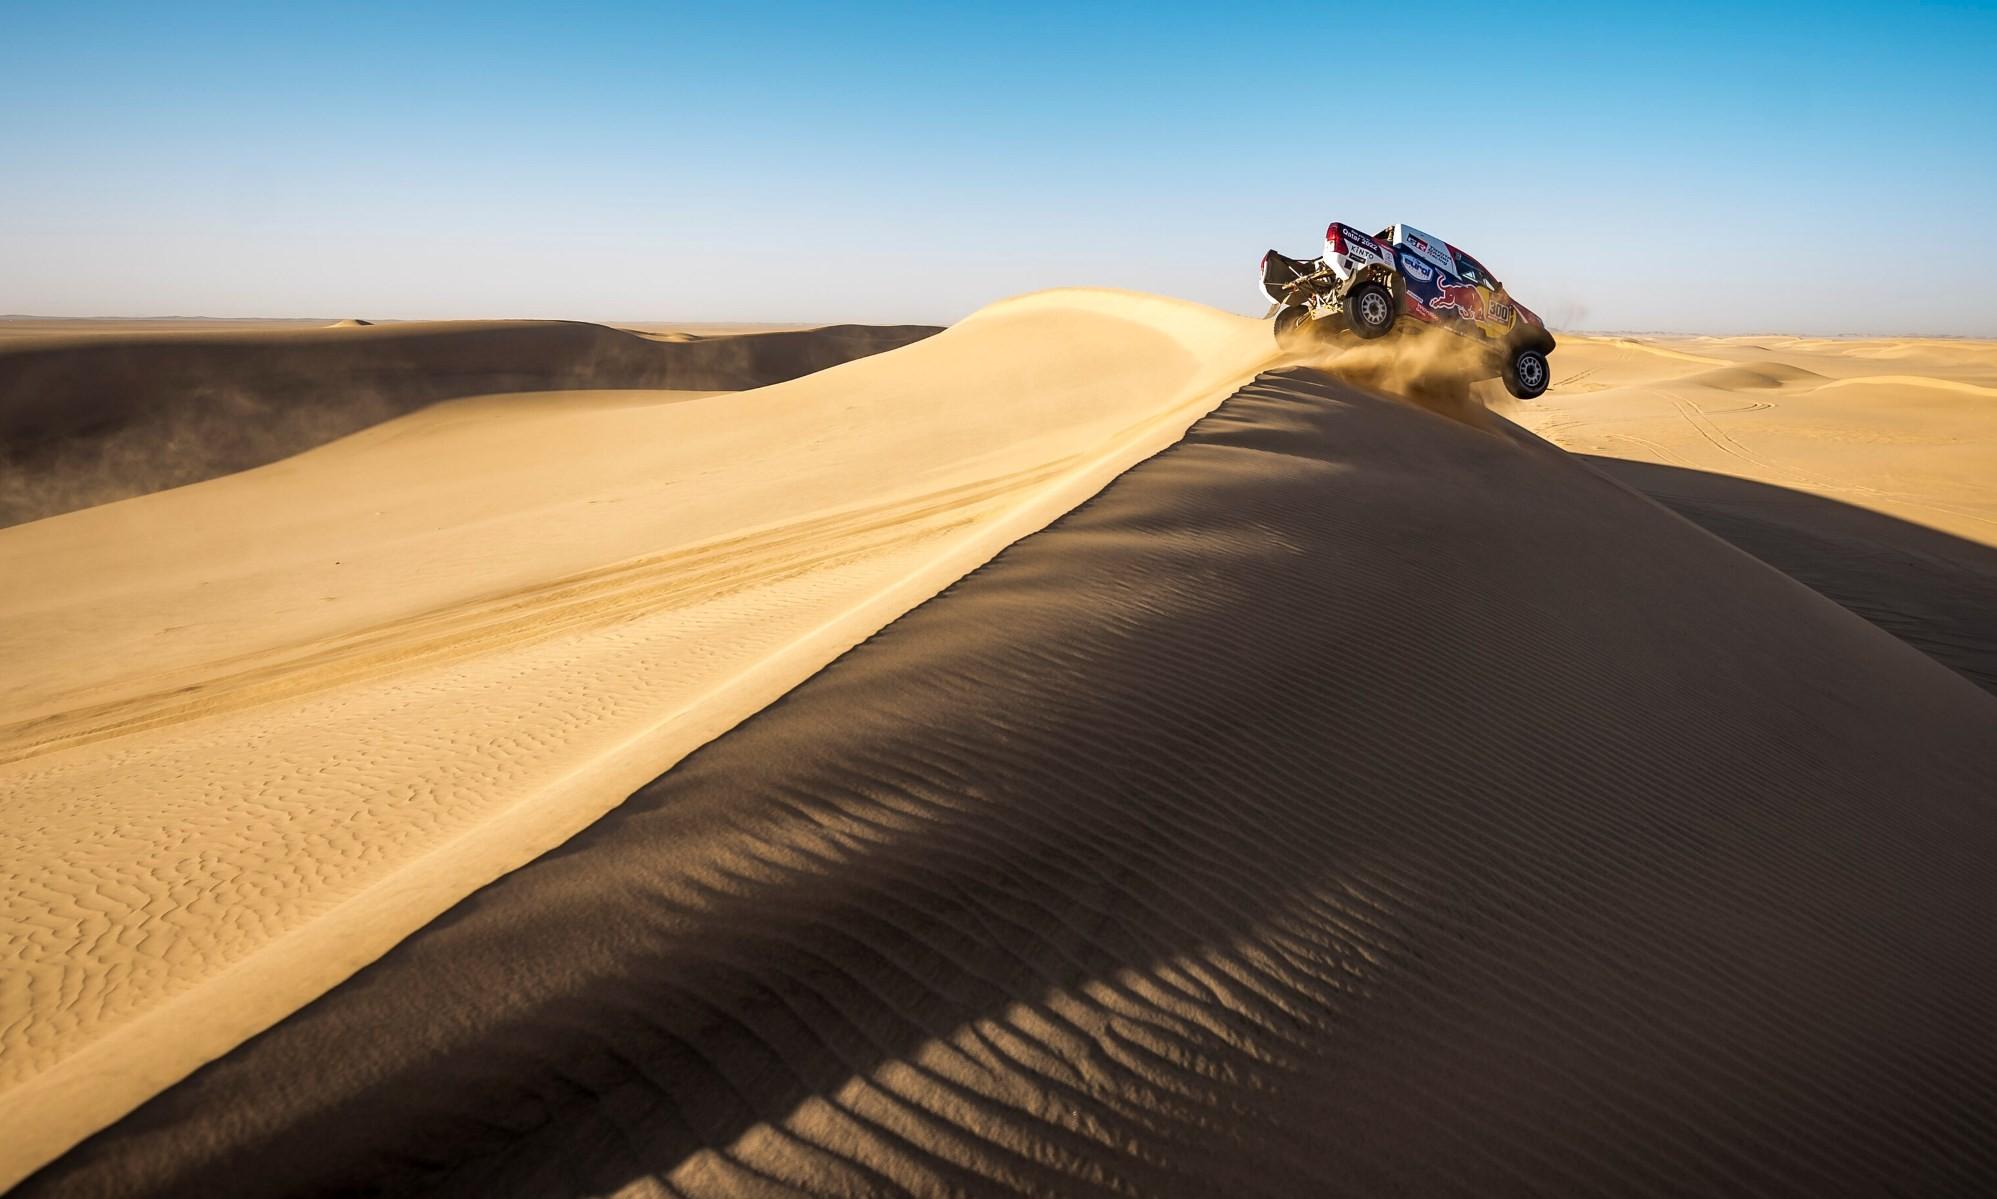 Nasser Al-Attiyah closed the gap to Sainz on 2020 Dakar Stage 8